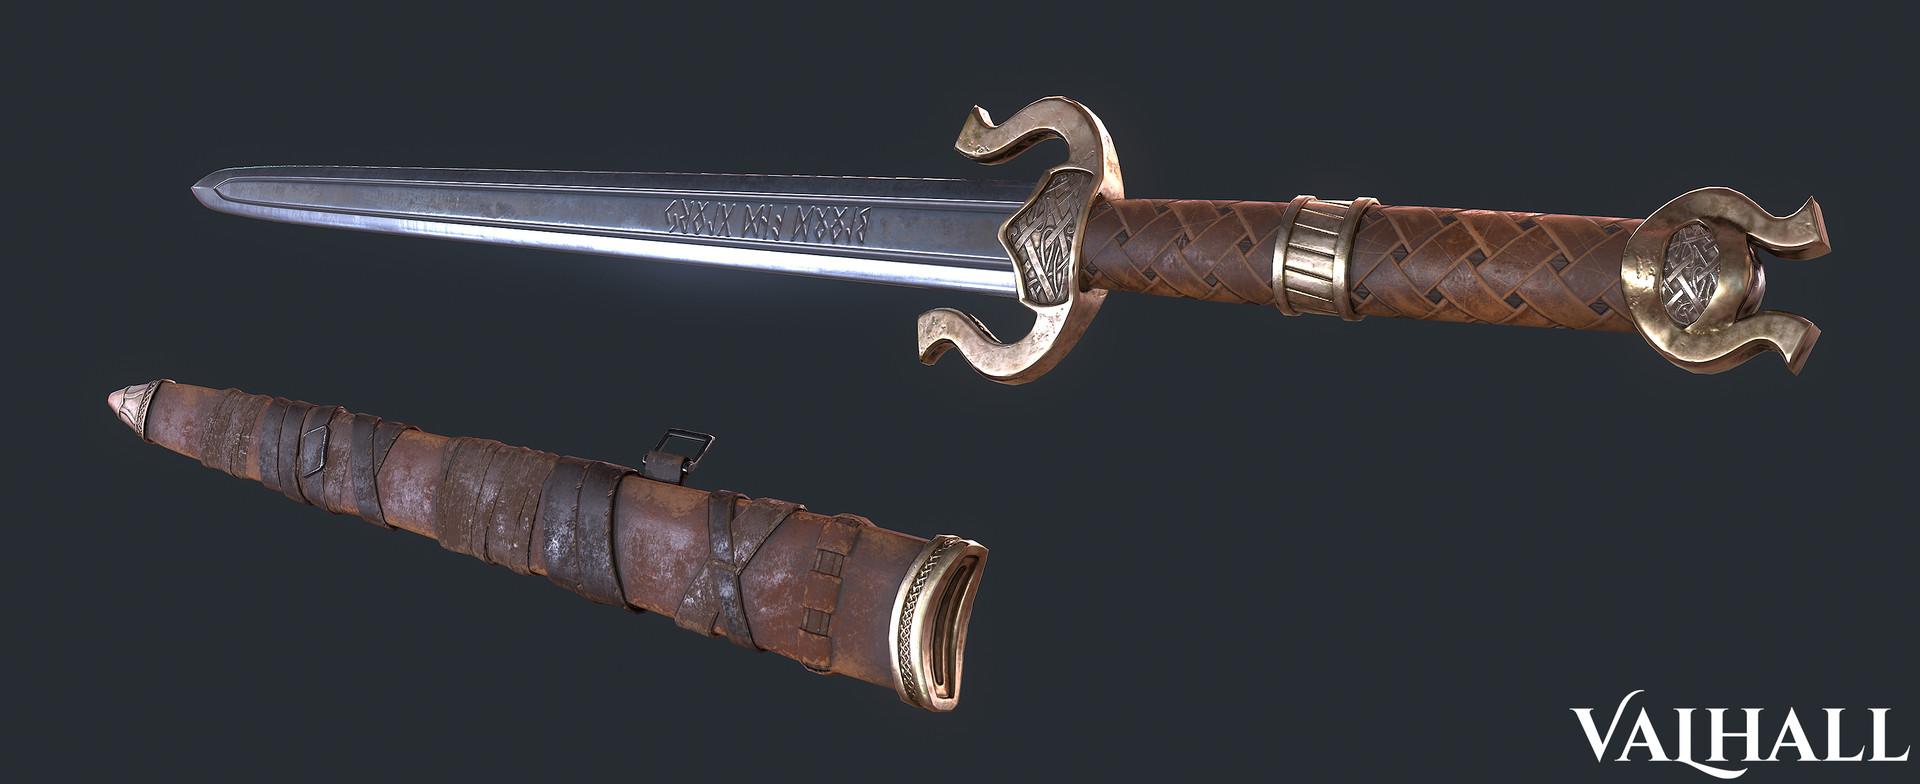 Roger perez sword02 sideback